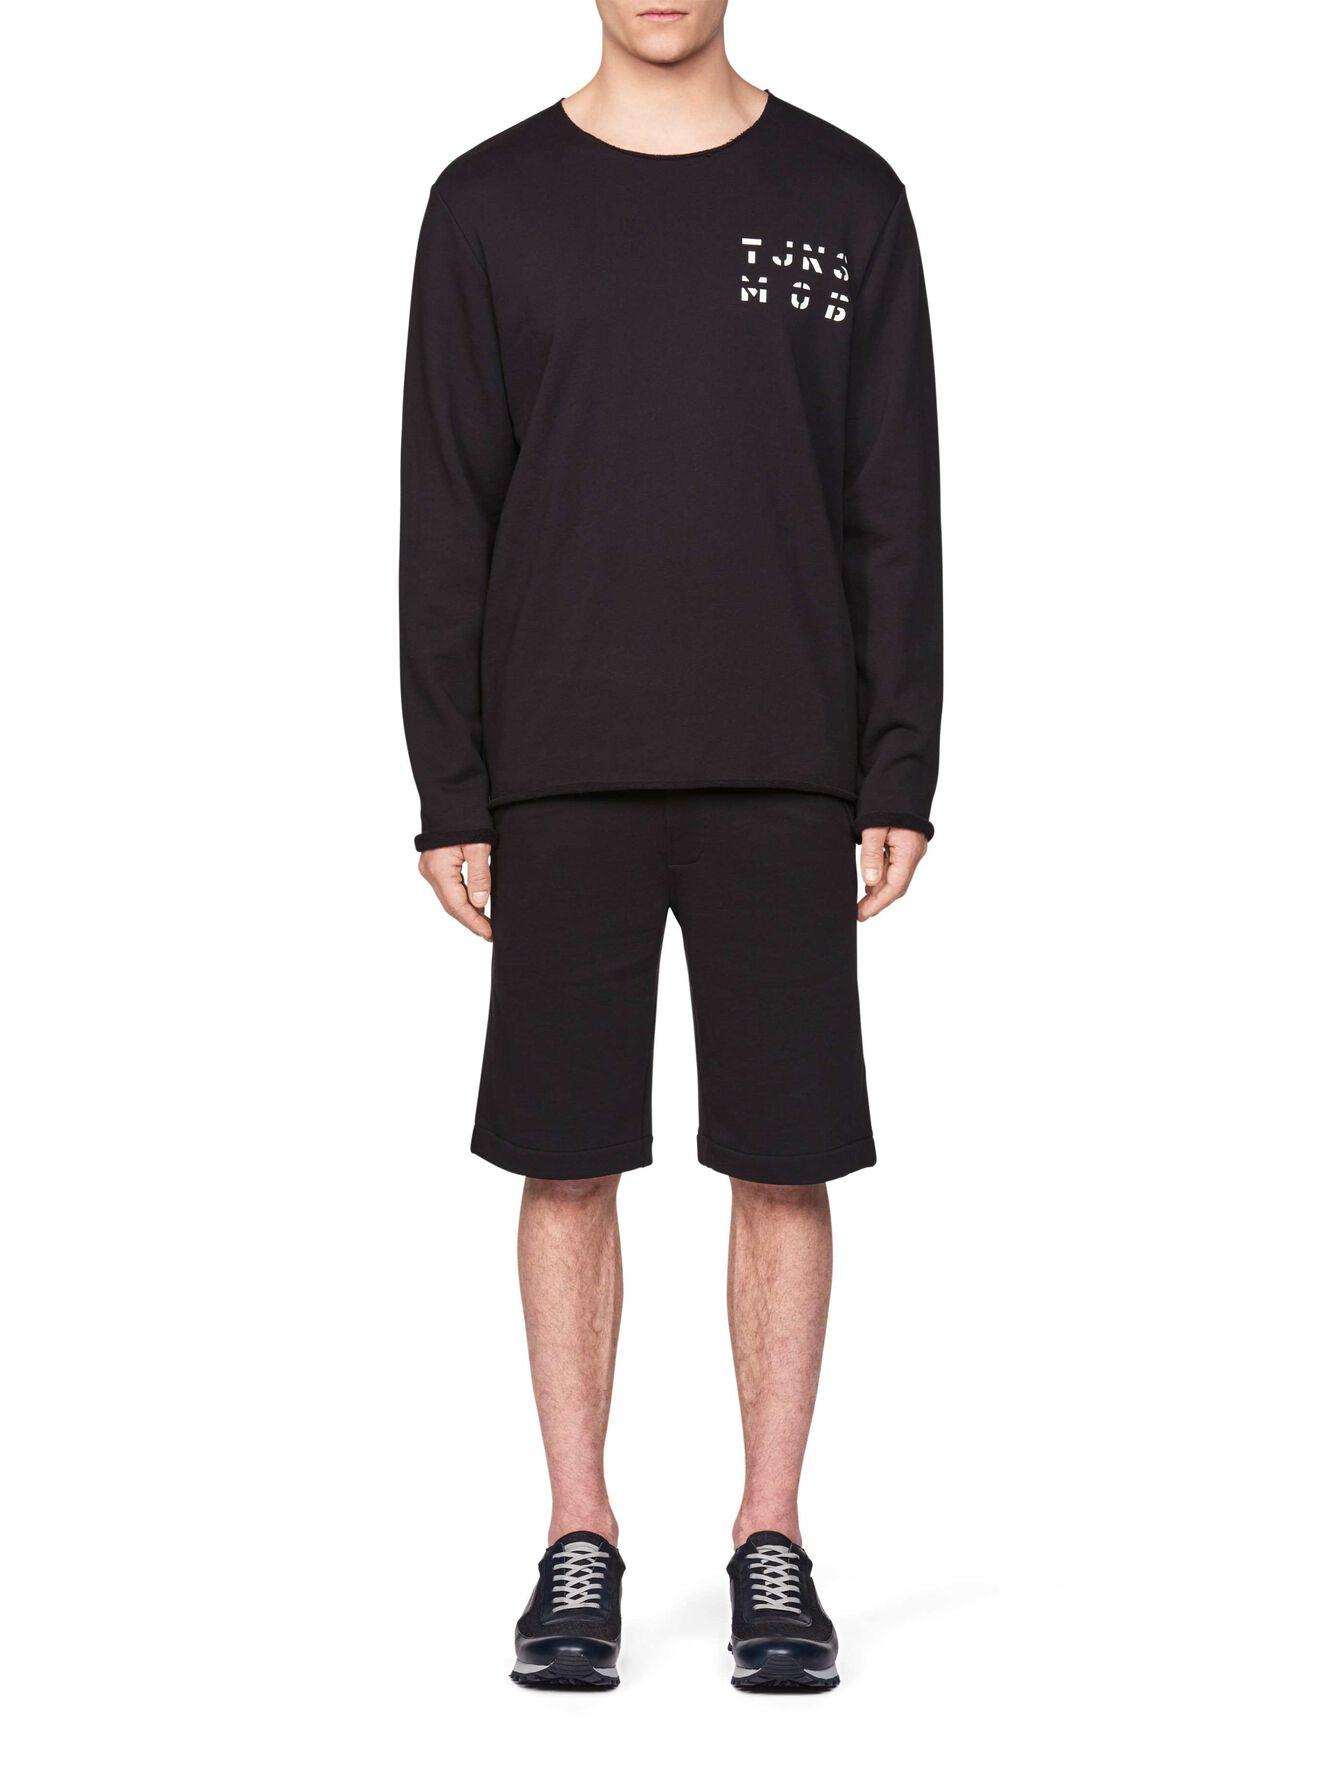 Destroyed  Sweatshirt in Black from Tiger of Sweden